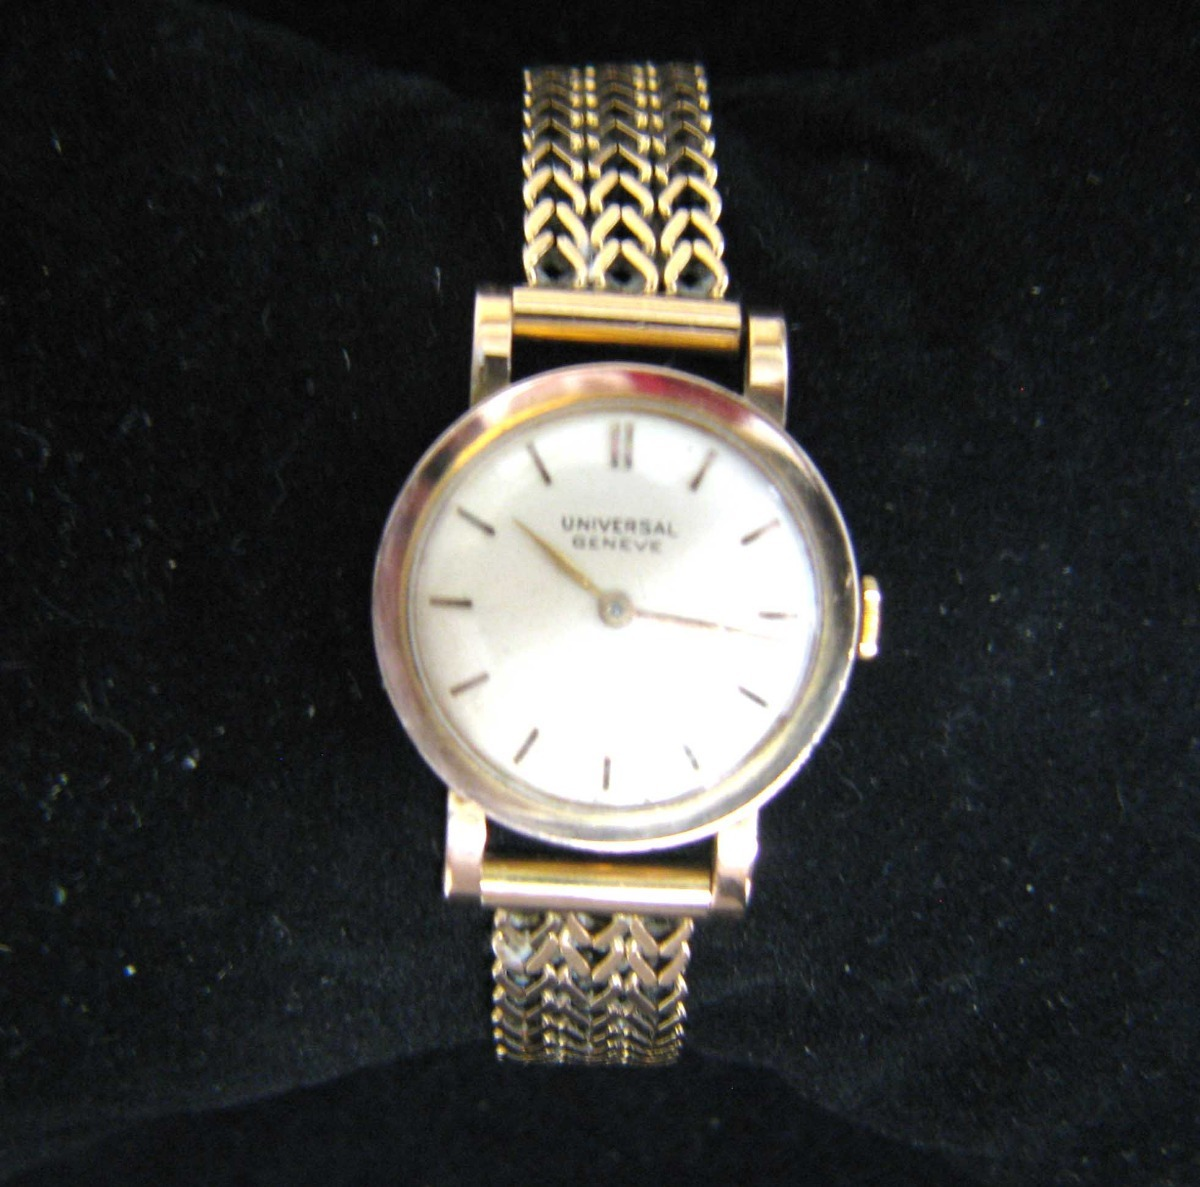 318b5c3e829 relógio universal geneve polerouter - feminino - ouro 18k. Carregando zoom.